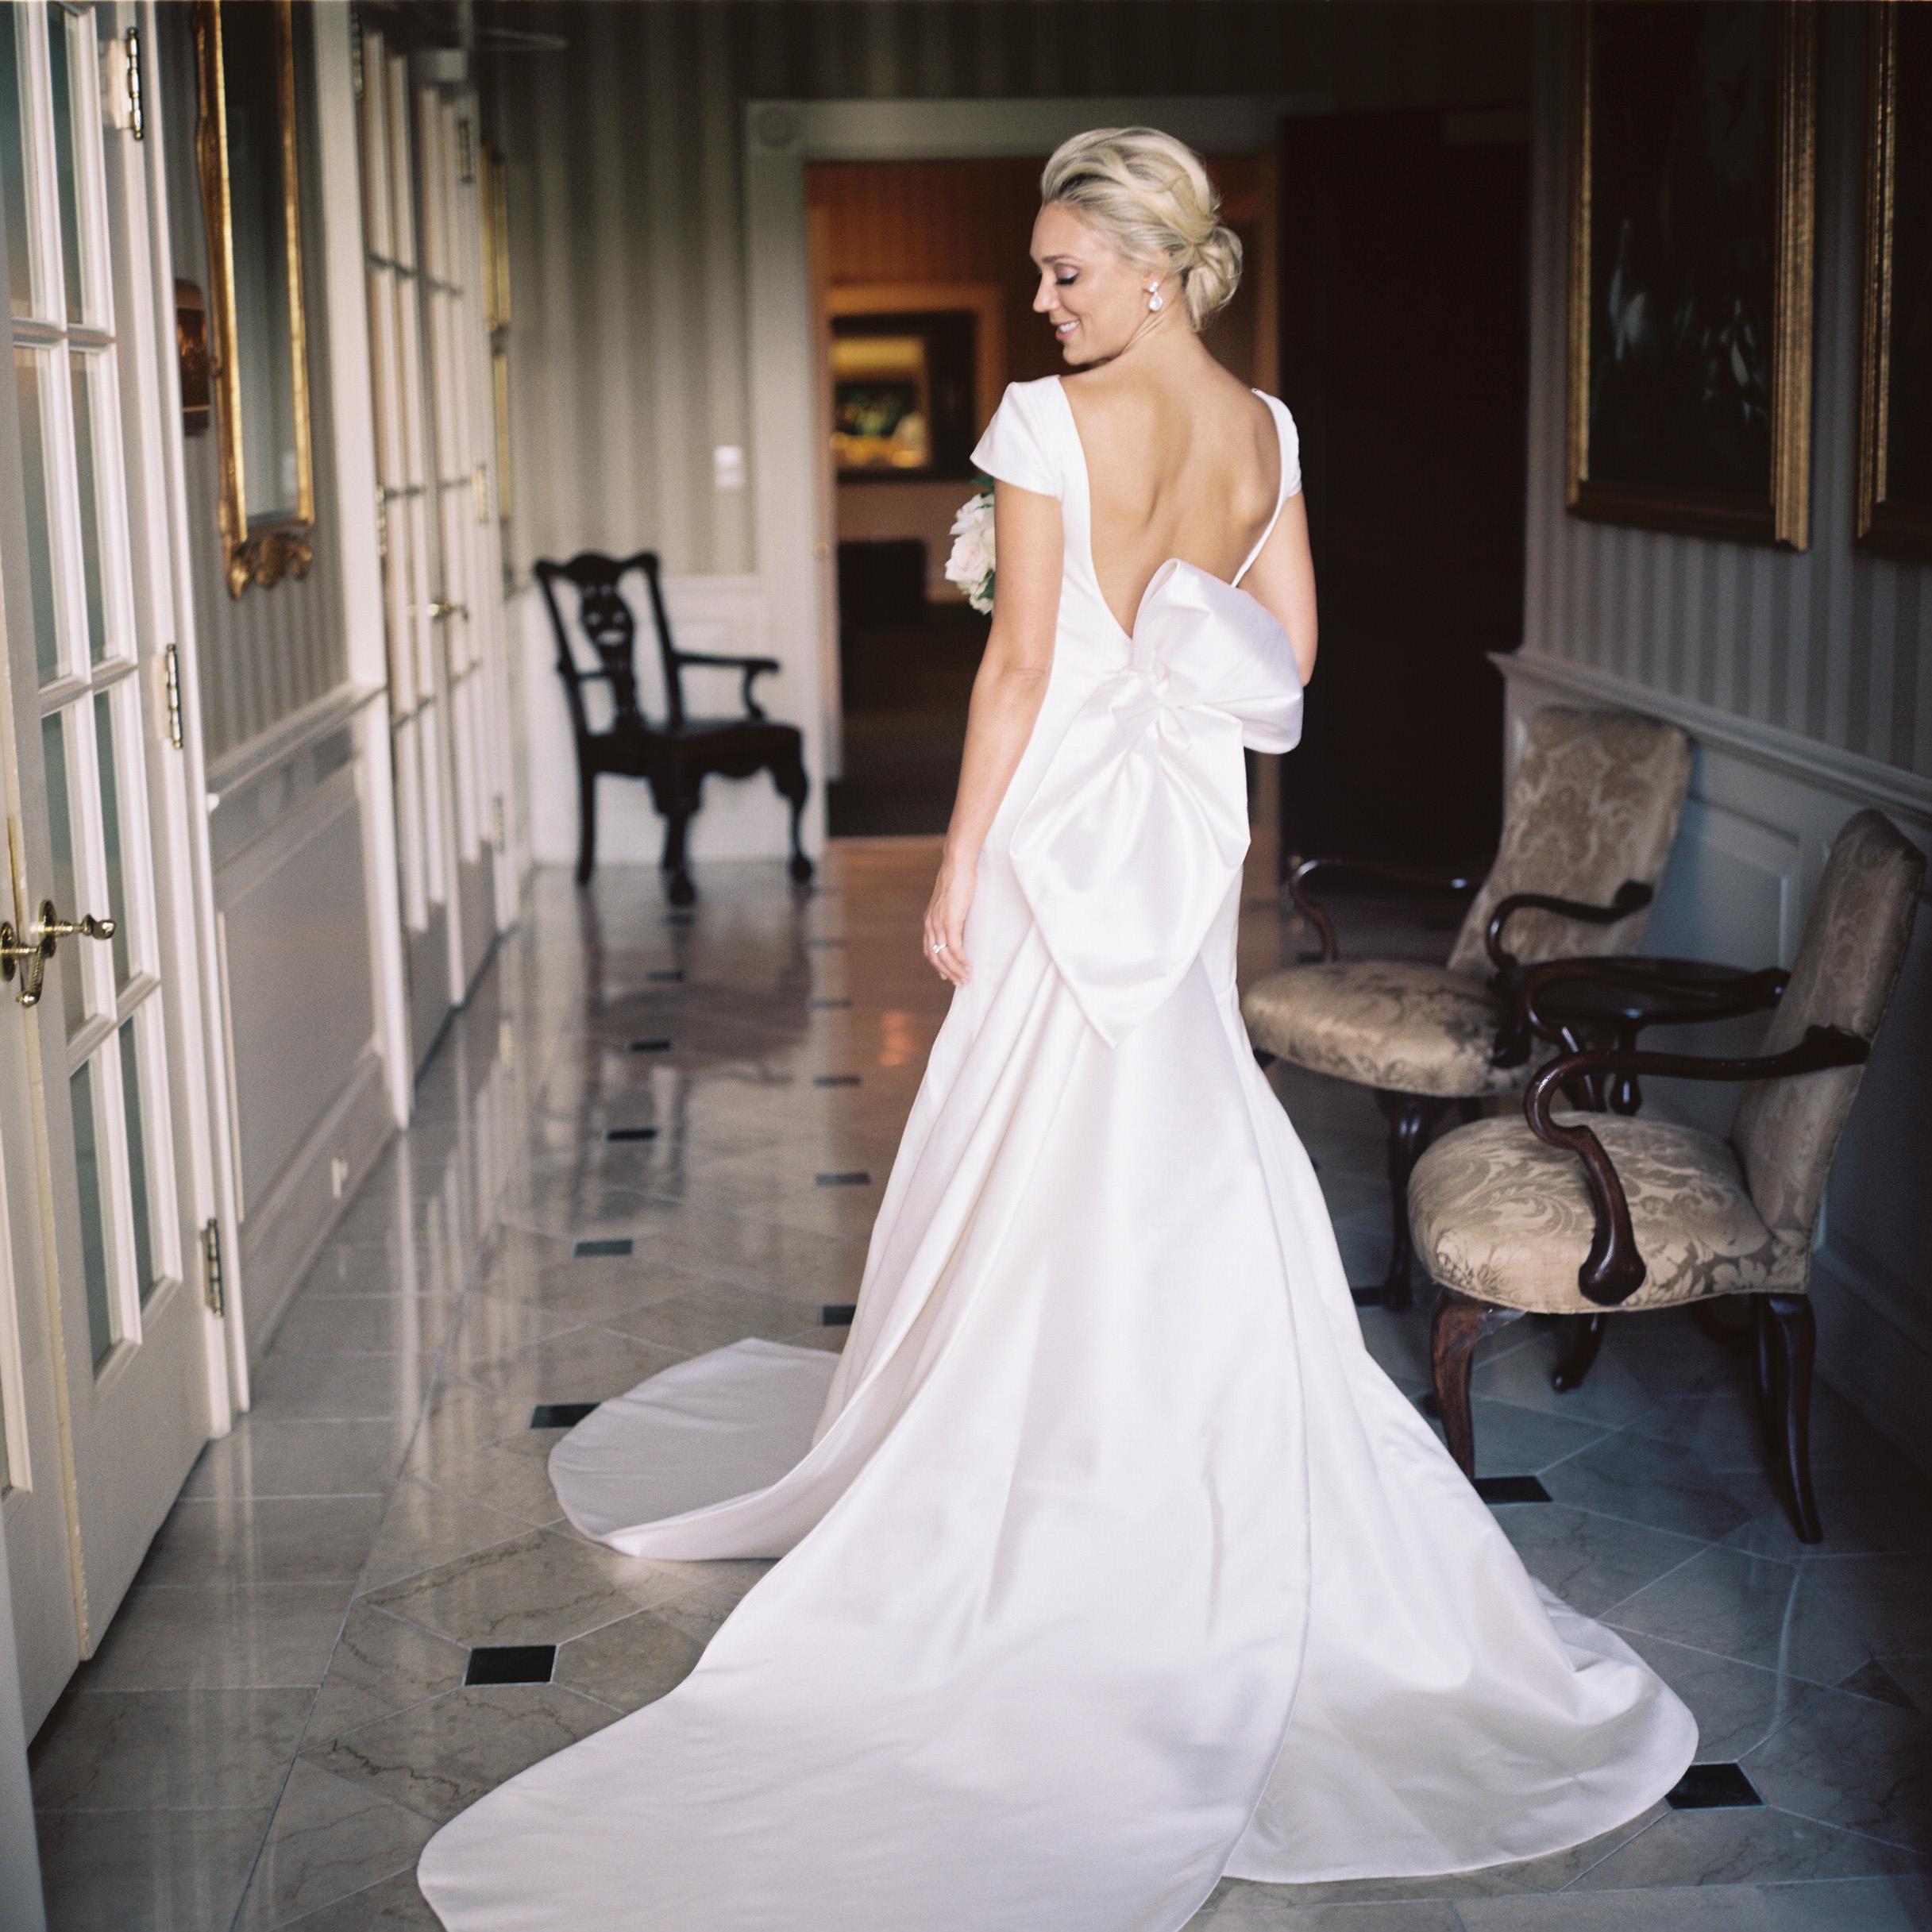 Charleston Wedding Photographers Virgil Bunao Hannah and Bailey | Charlotte Wedding | Part One